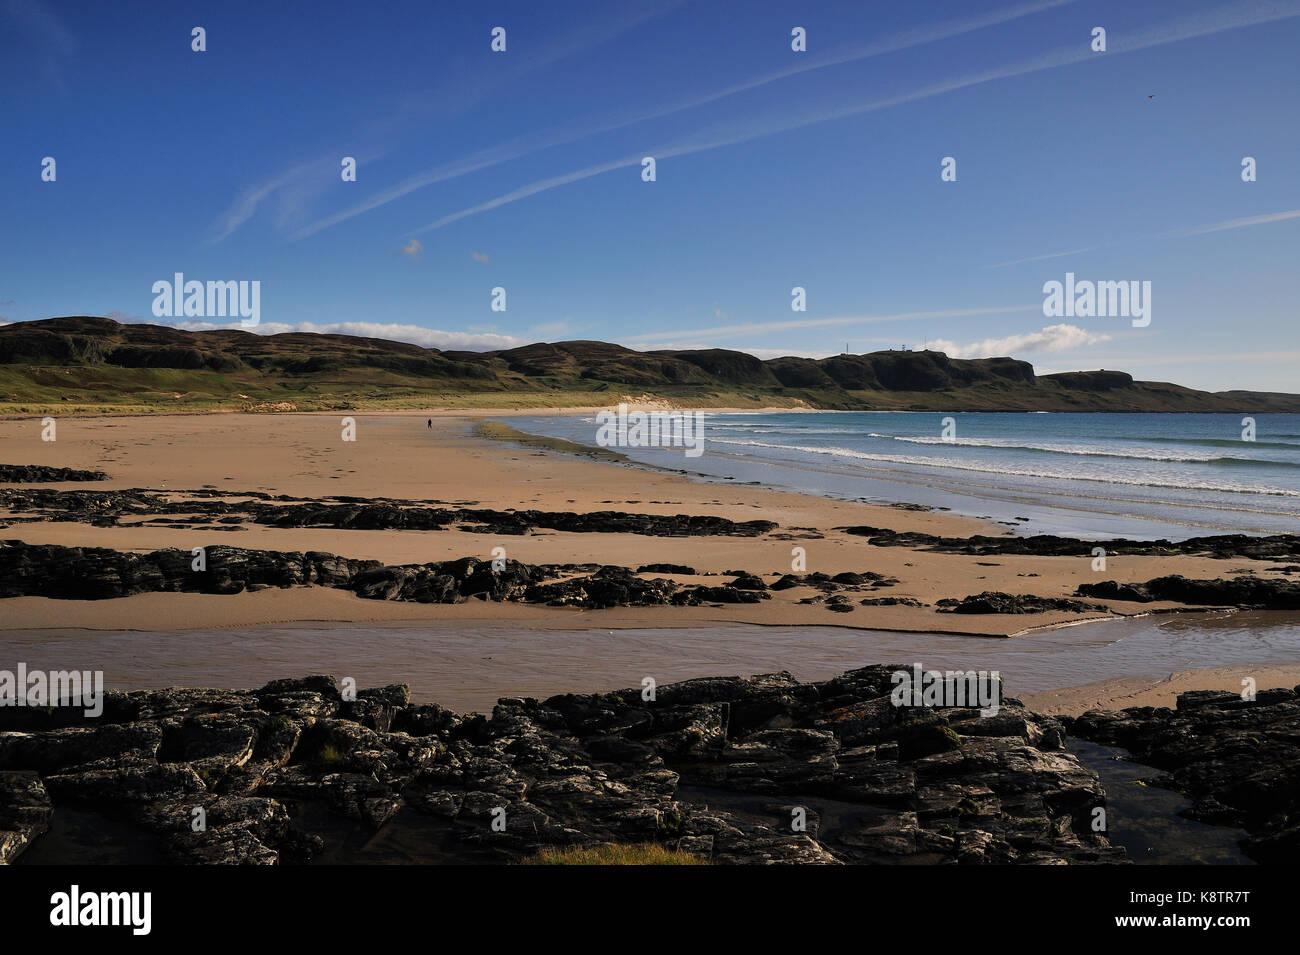 Machir Beach Islay Scotland - Stock Image